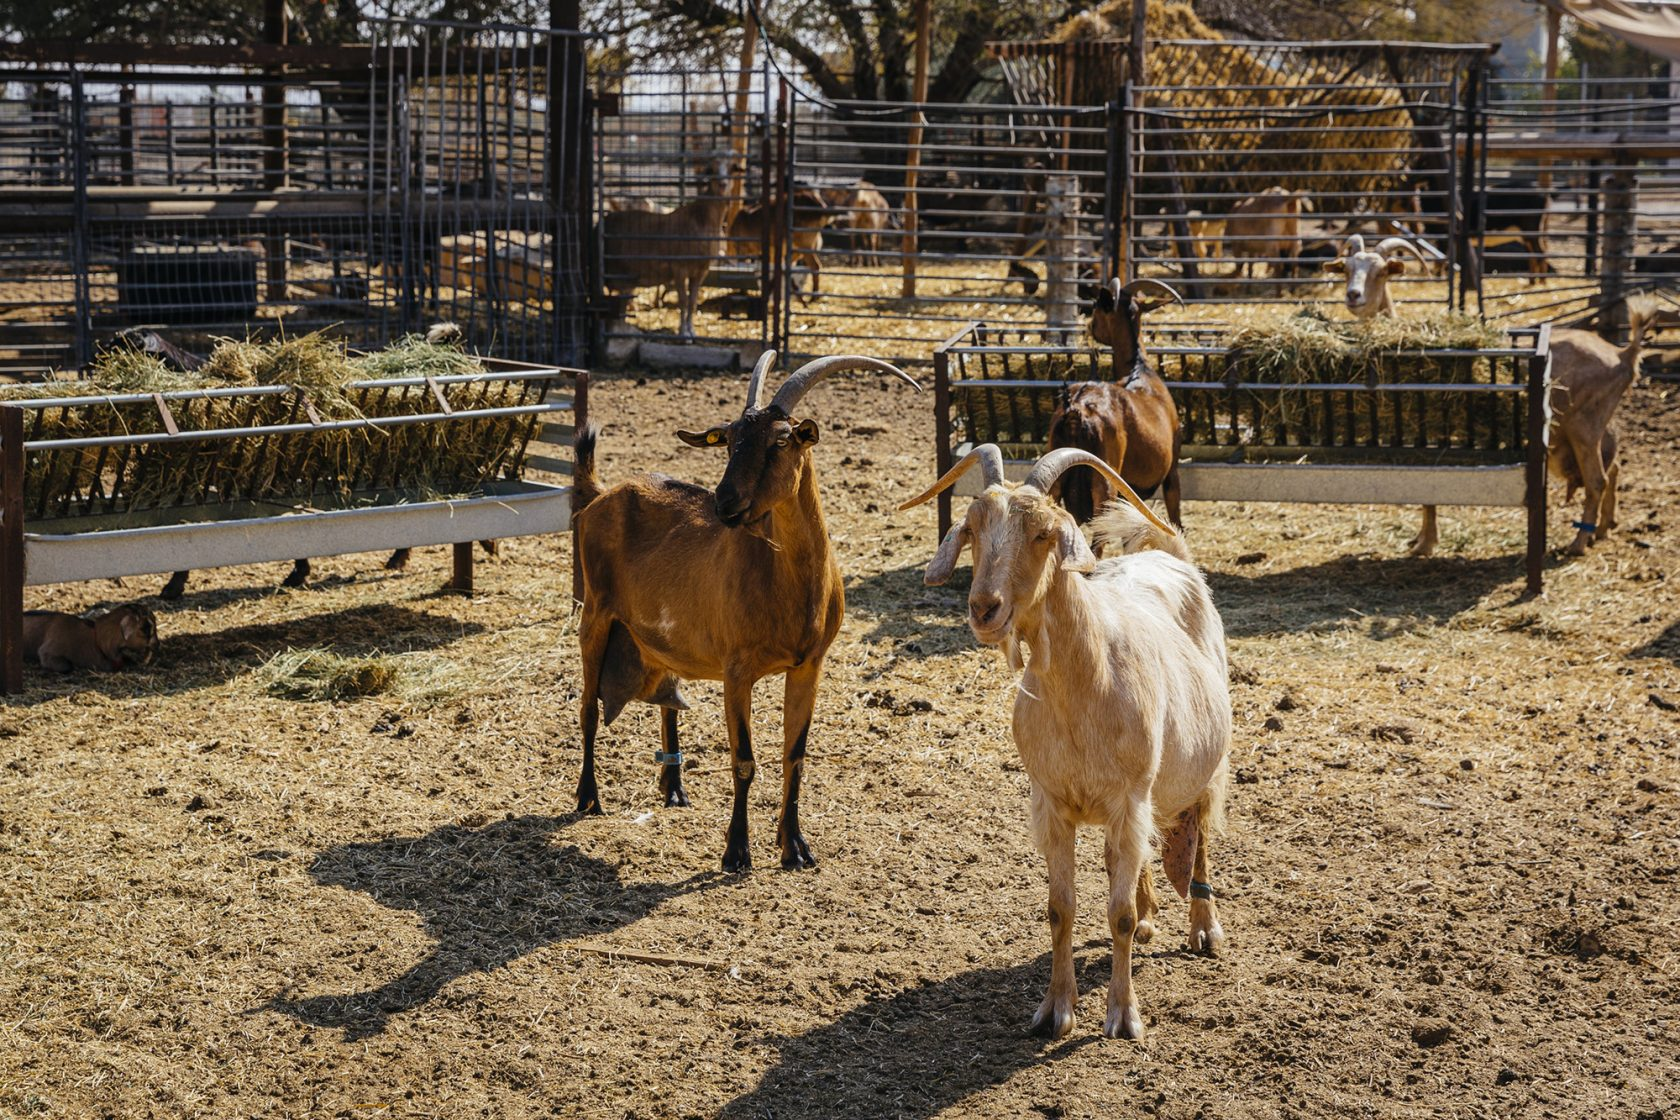 Six Senses Shaharut, Israel – Kibbutz